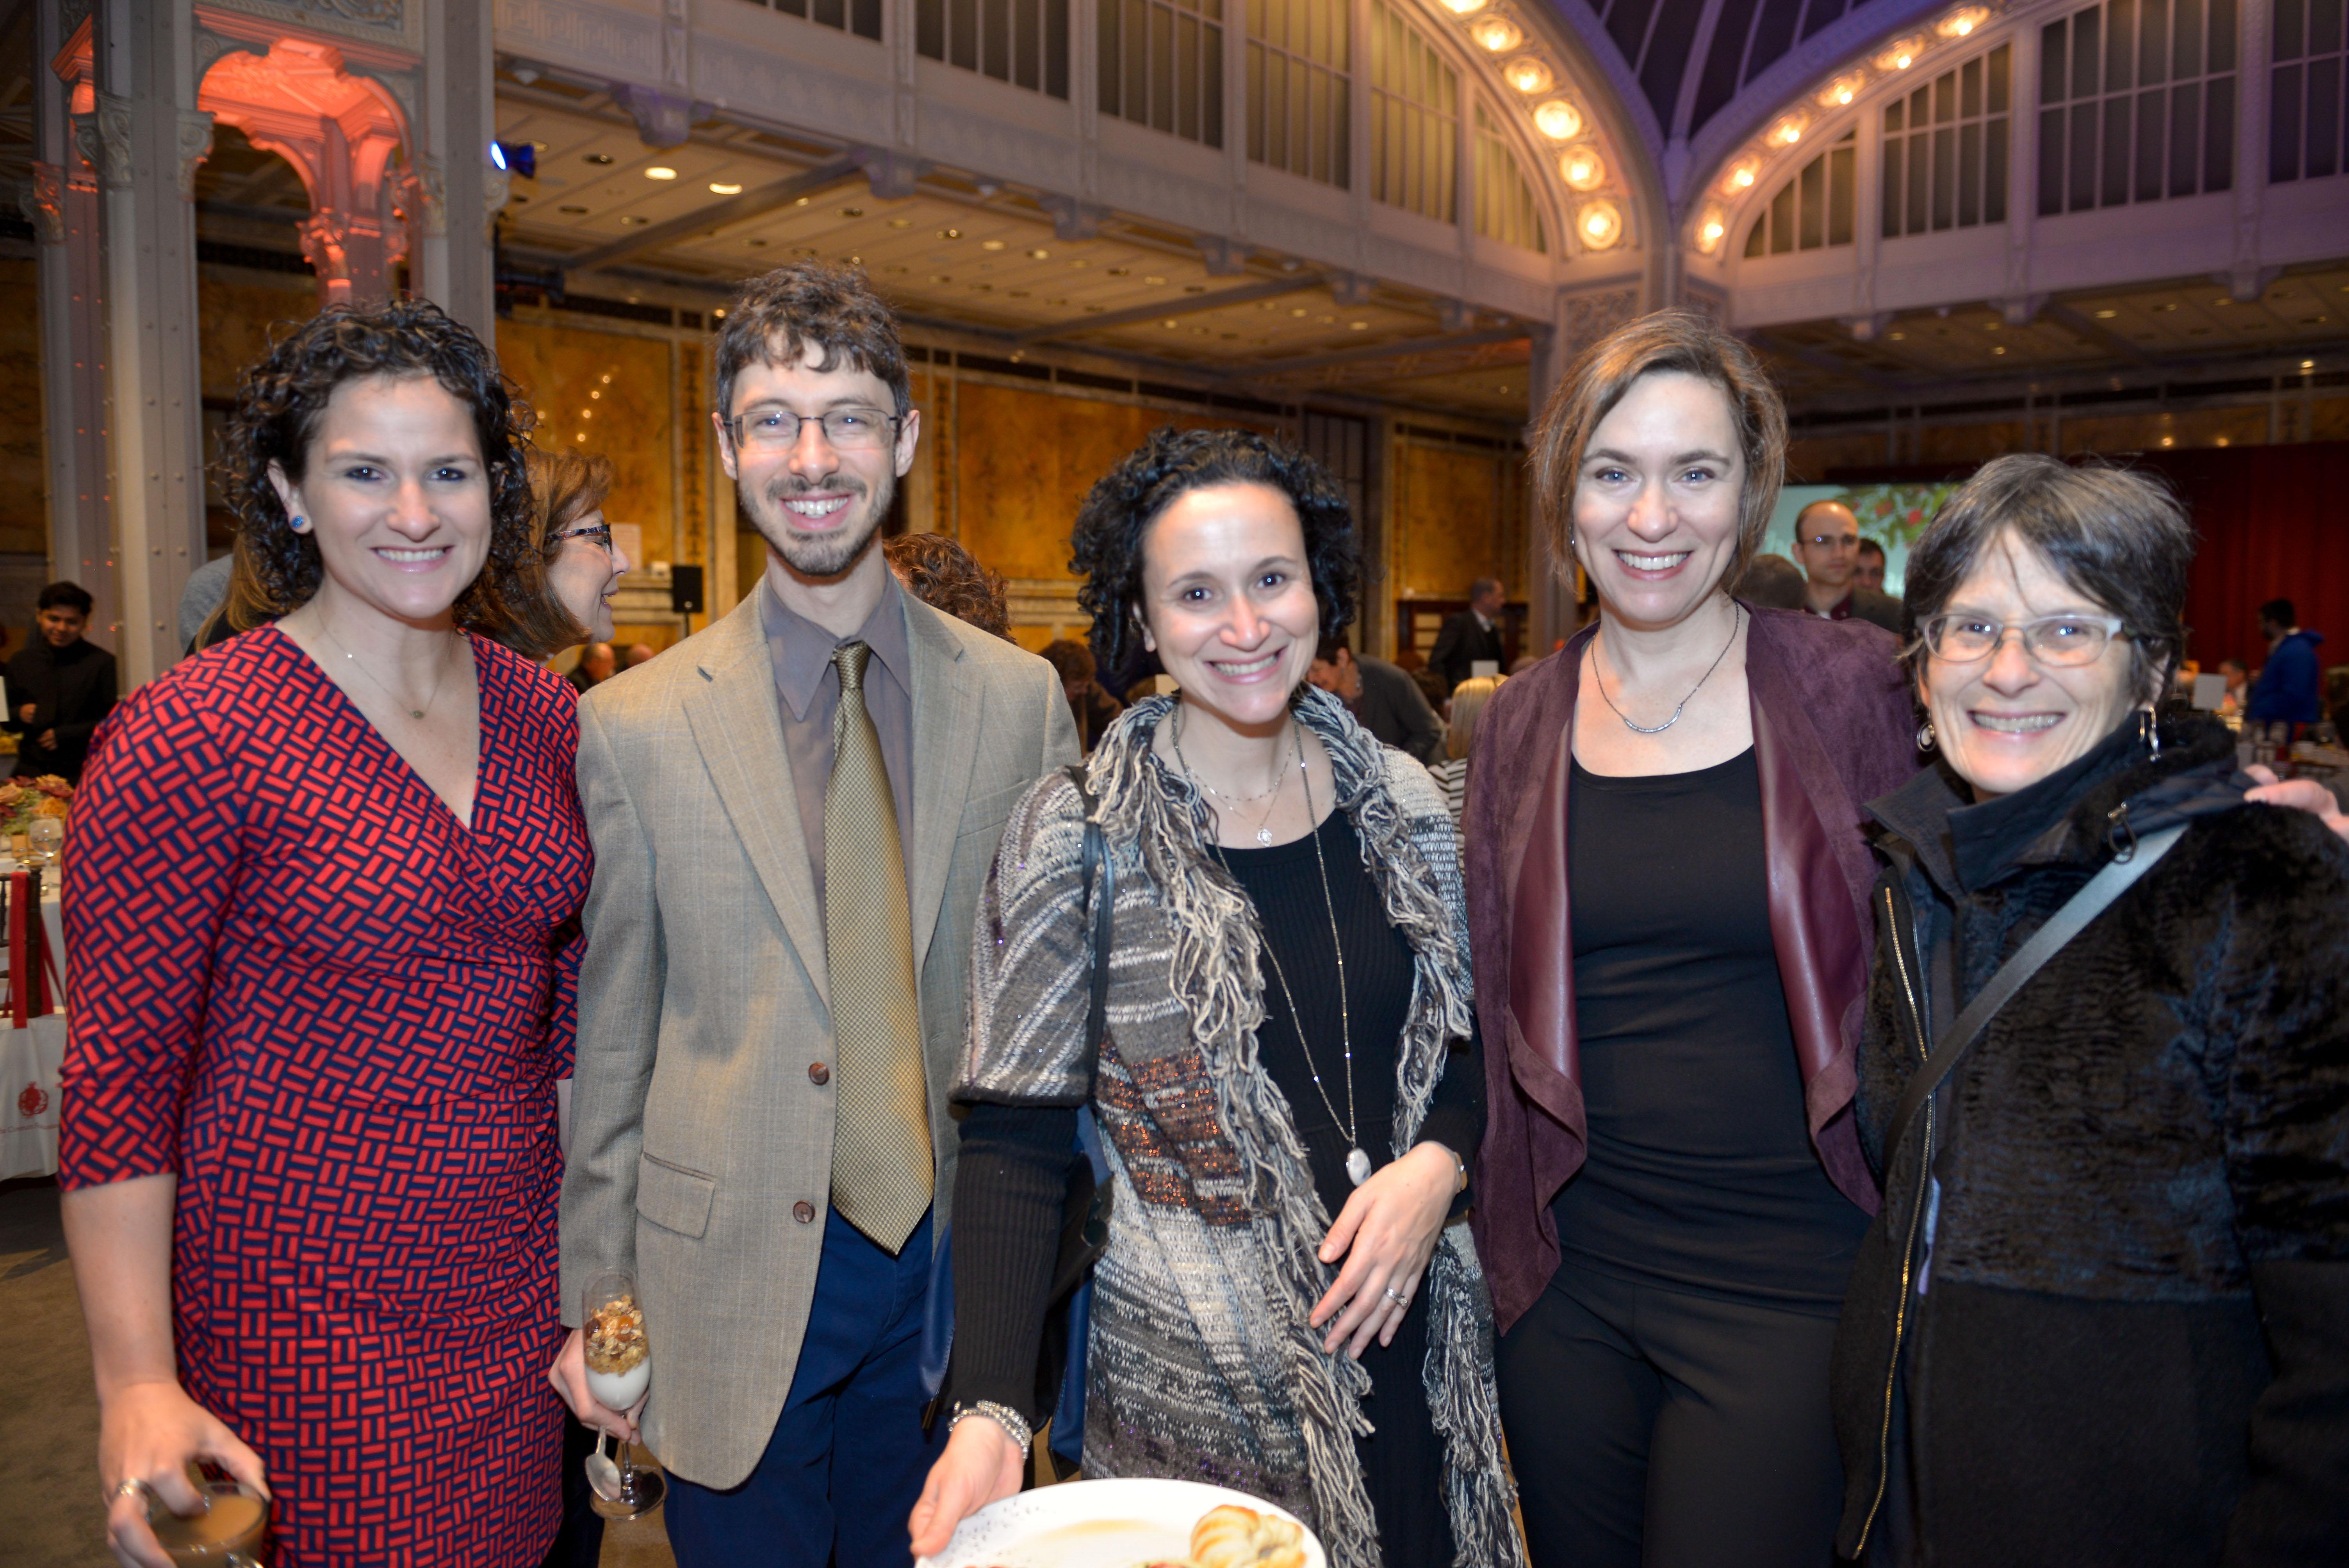 From left: 2018 Pomegranate Prize Recipient Maiya Chard-Yaron, Rabbi Lev Meirowitz Nelson, Dr. Miriam Heller Stern, Dr. Judith Rosenbaum, and Rabbi Sharon Cohen Anisfeld.